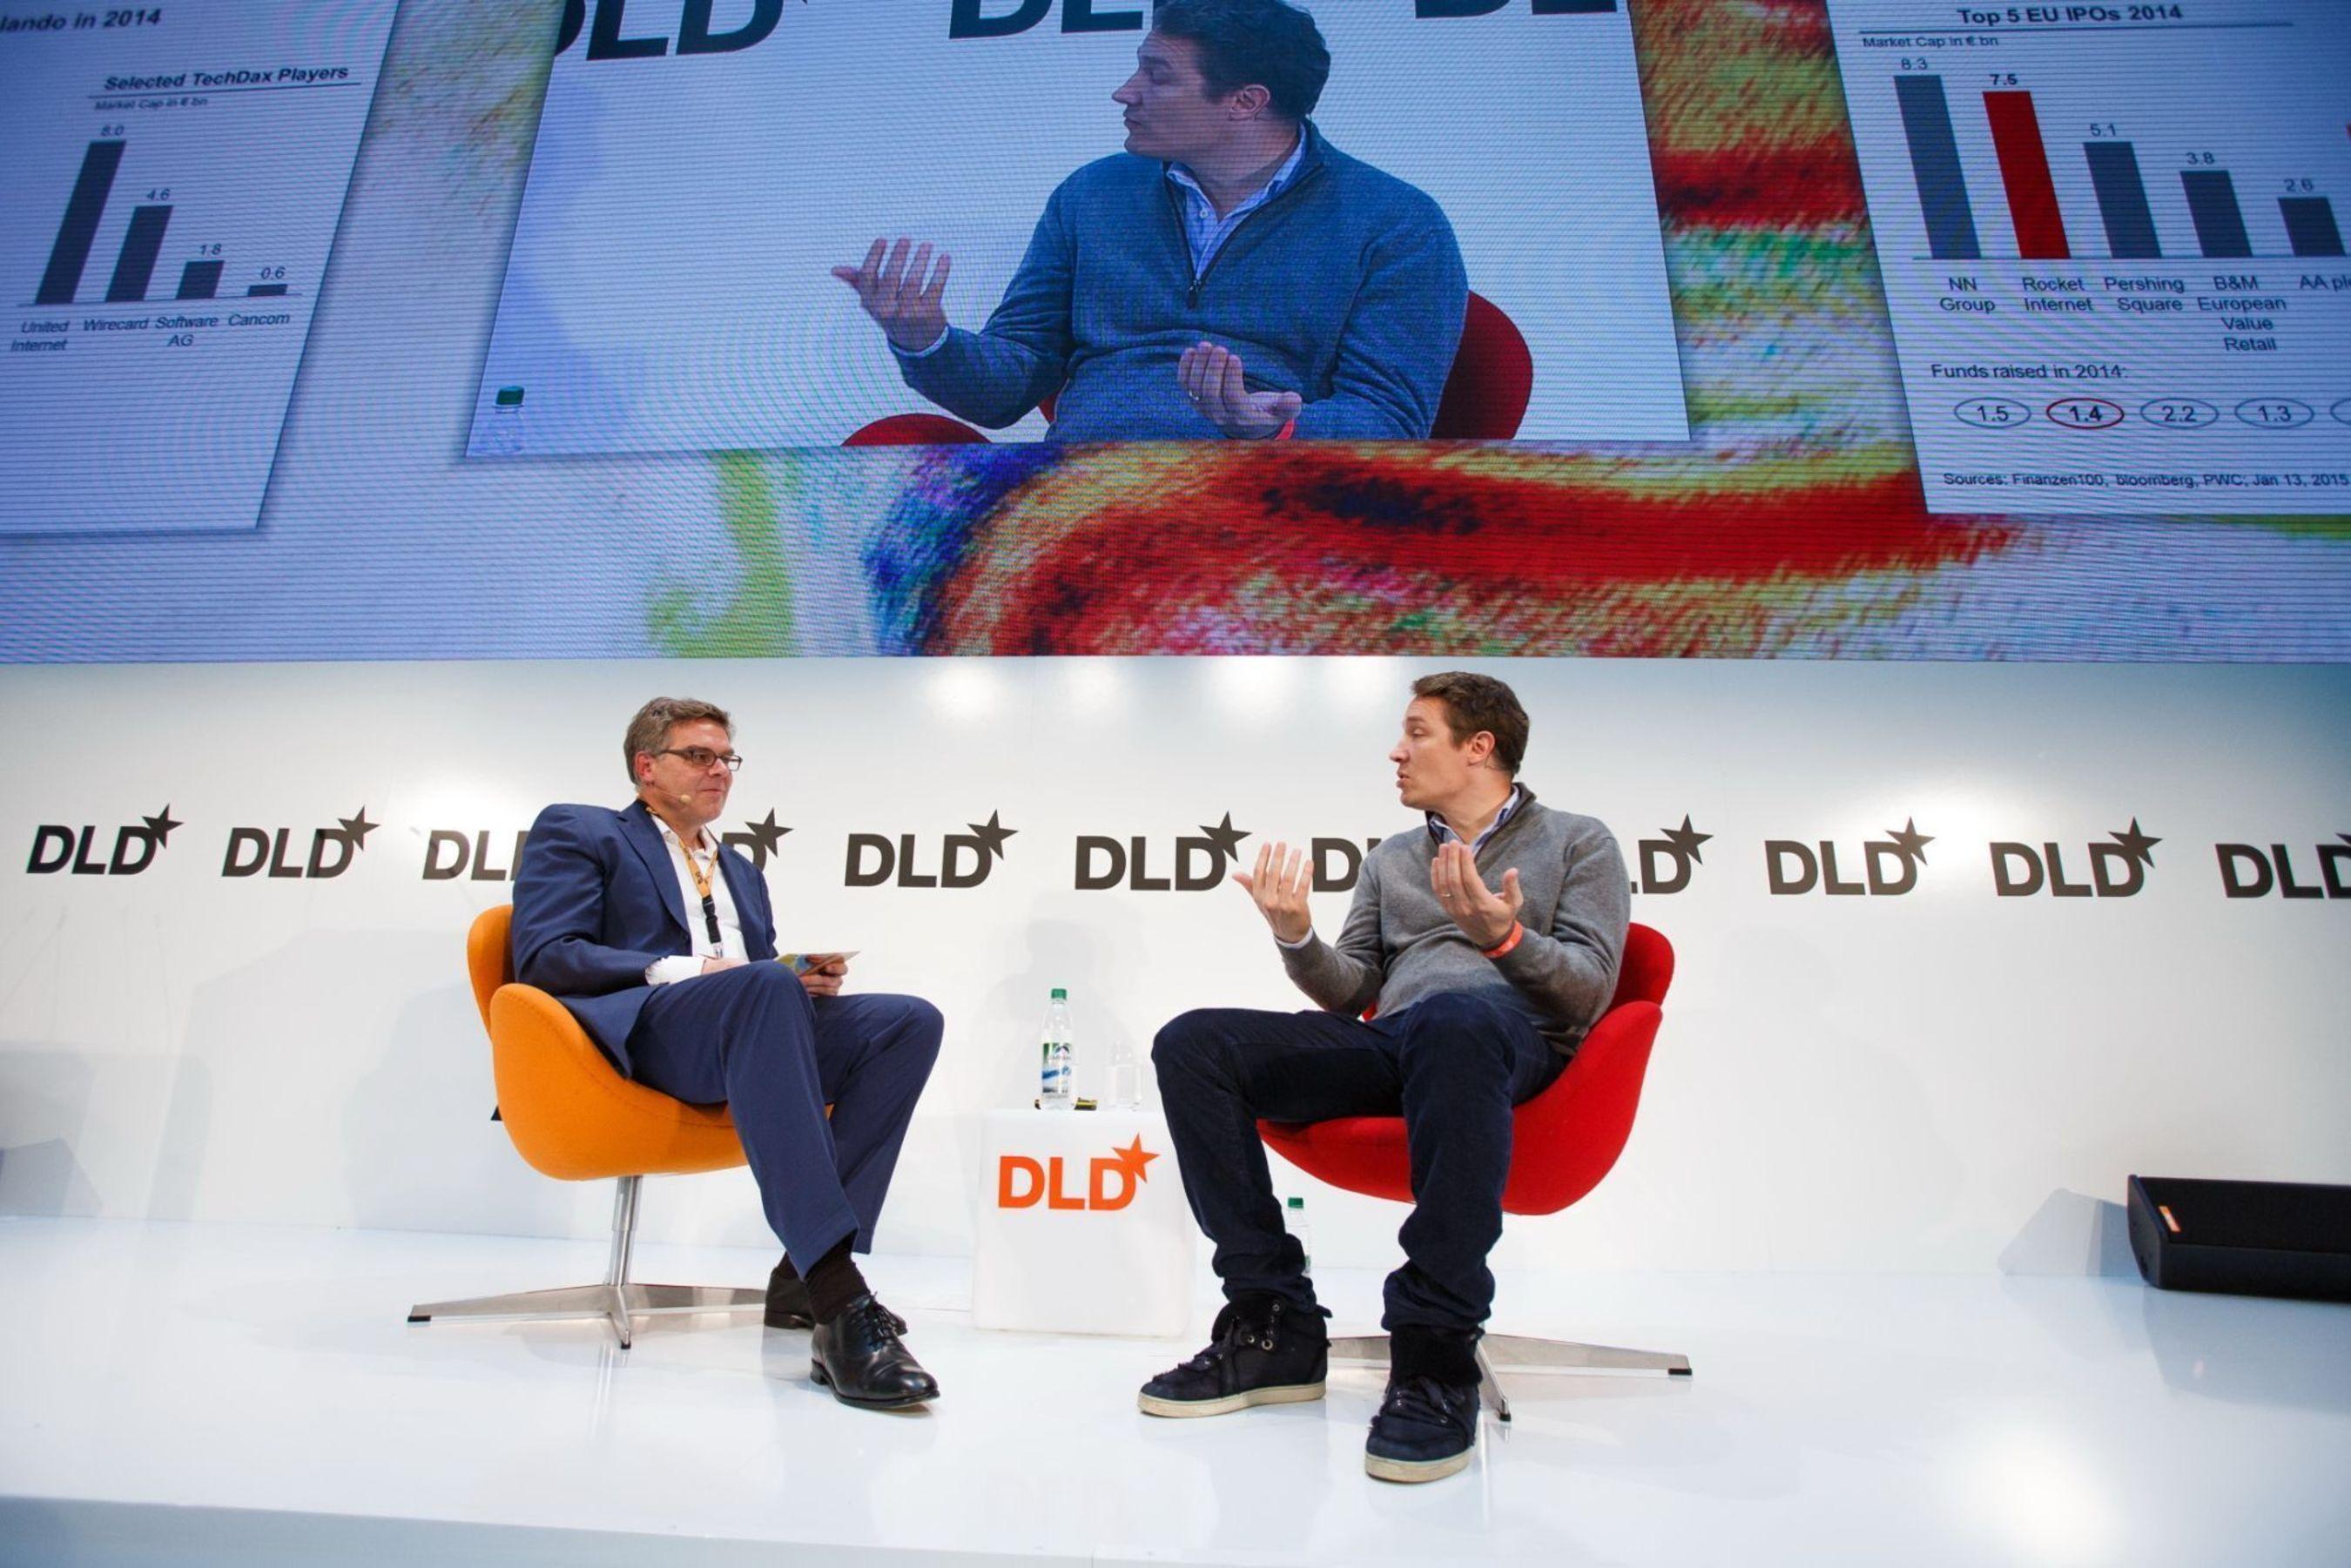 Burda Board Member Stefan Winners spoke with Oliver Samwer, founder of Zalando, about the recipe for success enjoyed by start-up incubator Rocket Internet at the DLD conference in Munich (PRNewsFoto/Hubert Burda Media)